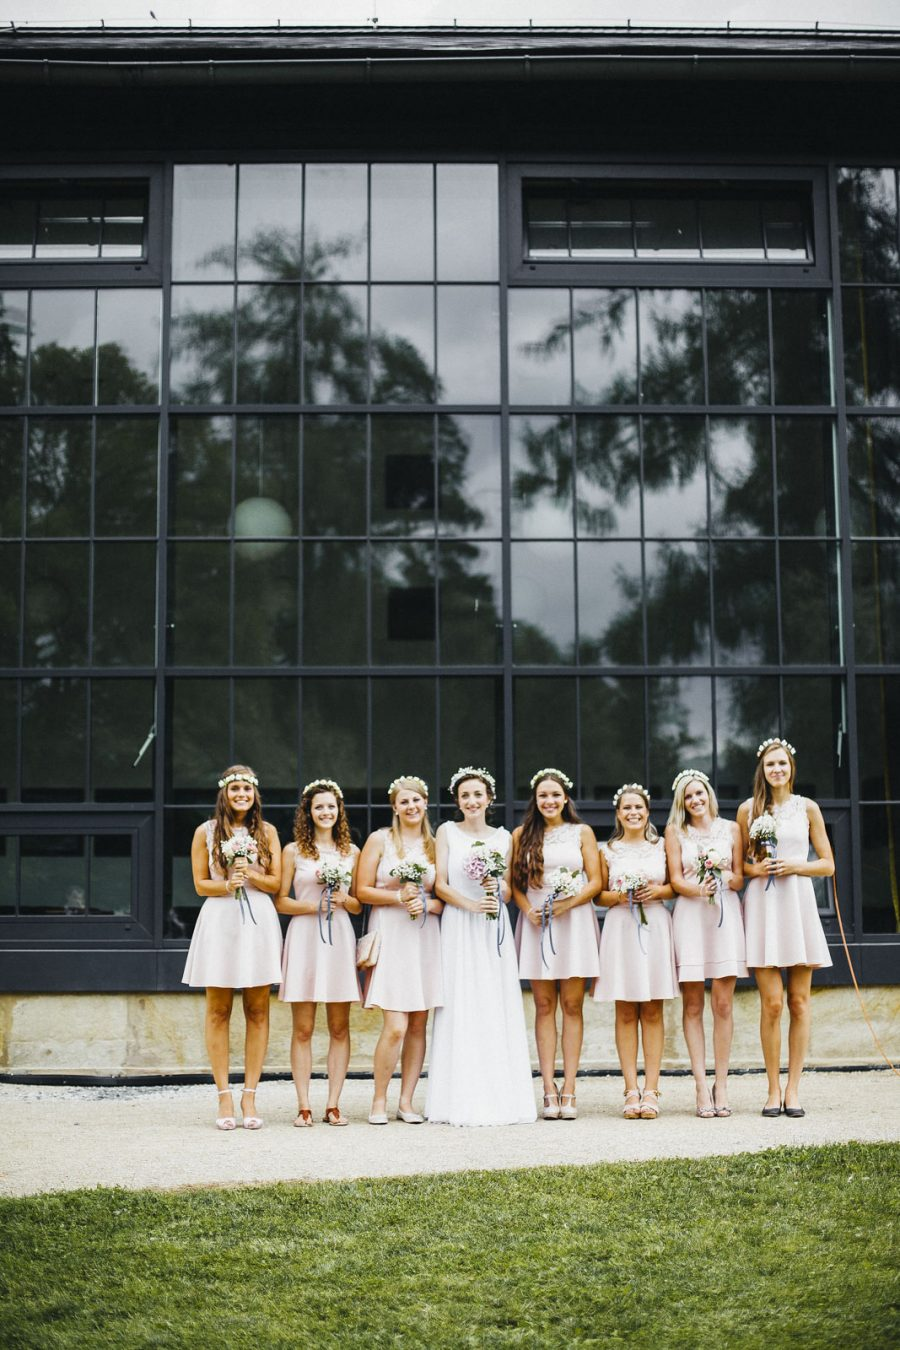 Bridesmaids in short pink dresses